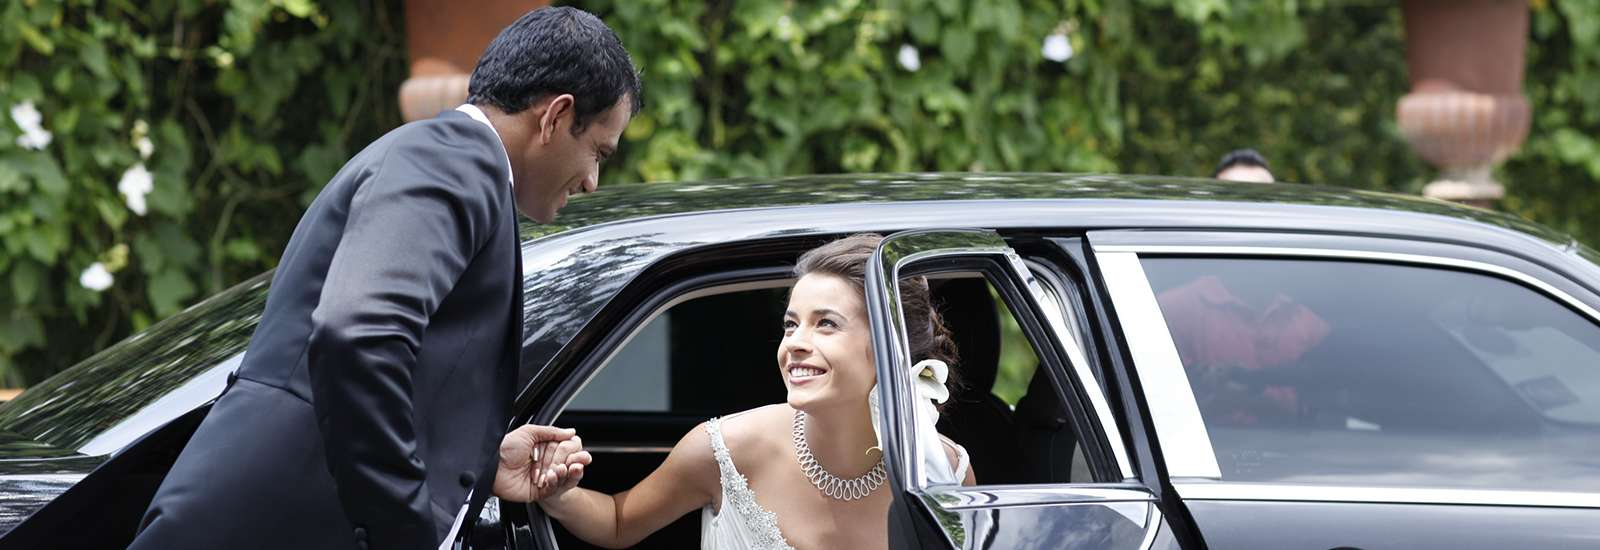 Wedding car rental services in Sri Lanka